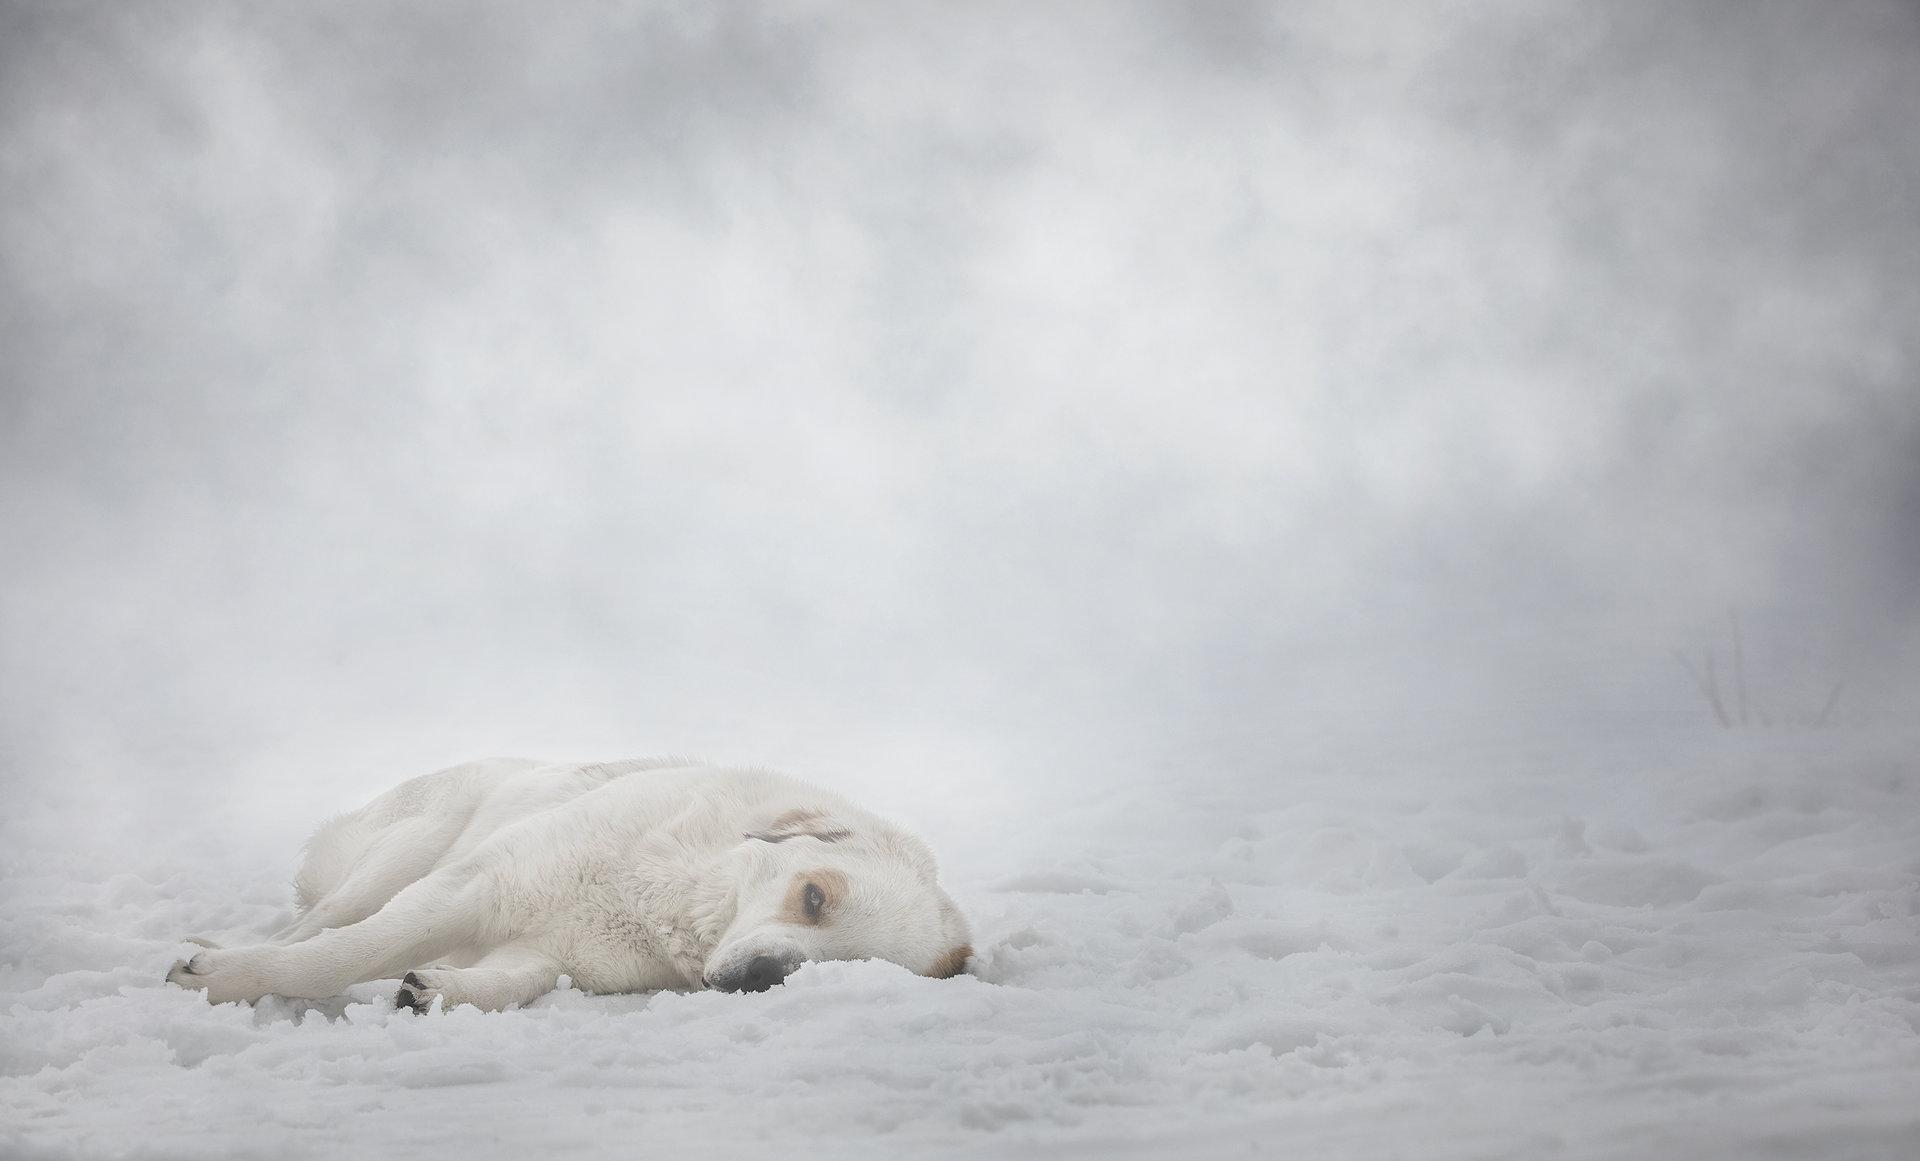 Умореният ветеран 2 | Author Vladimir Karamazov - Vlado79 | PHOTO FORUM